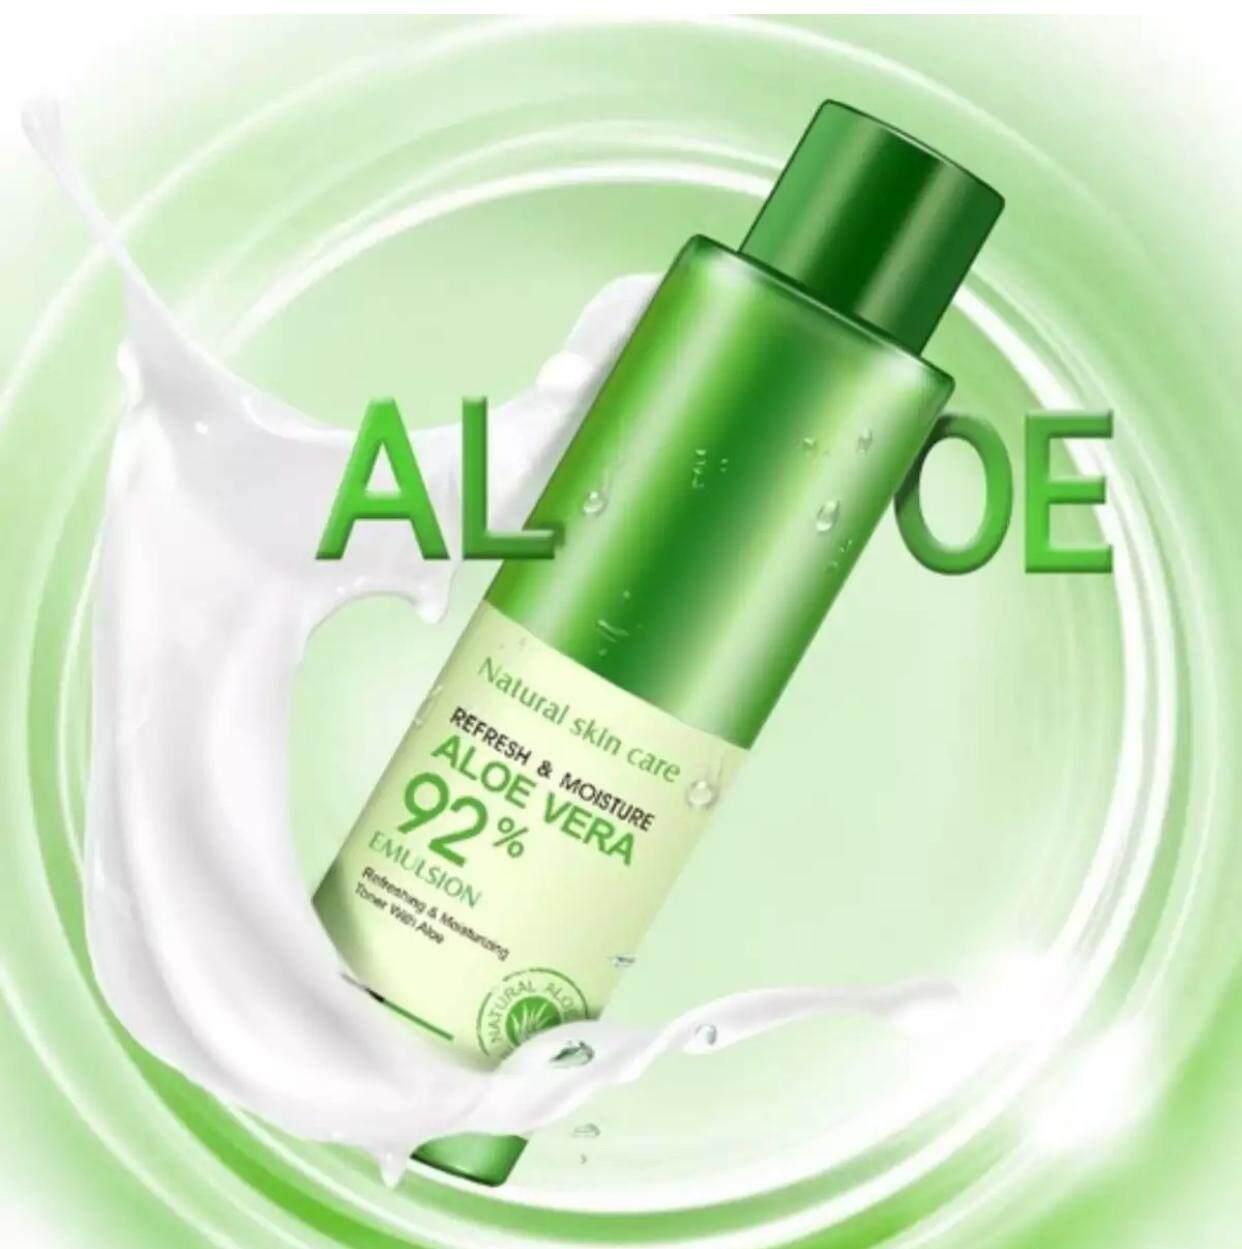 Fitur Vaseline Intensive Care Lotion Aloe Soothe 120ml Dan Harga Advance Strength 400 Ml 92 Vera Emulsion Face Cream Refreshing And Moisturizing Natural Skin